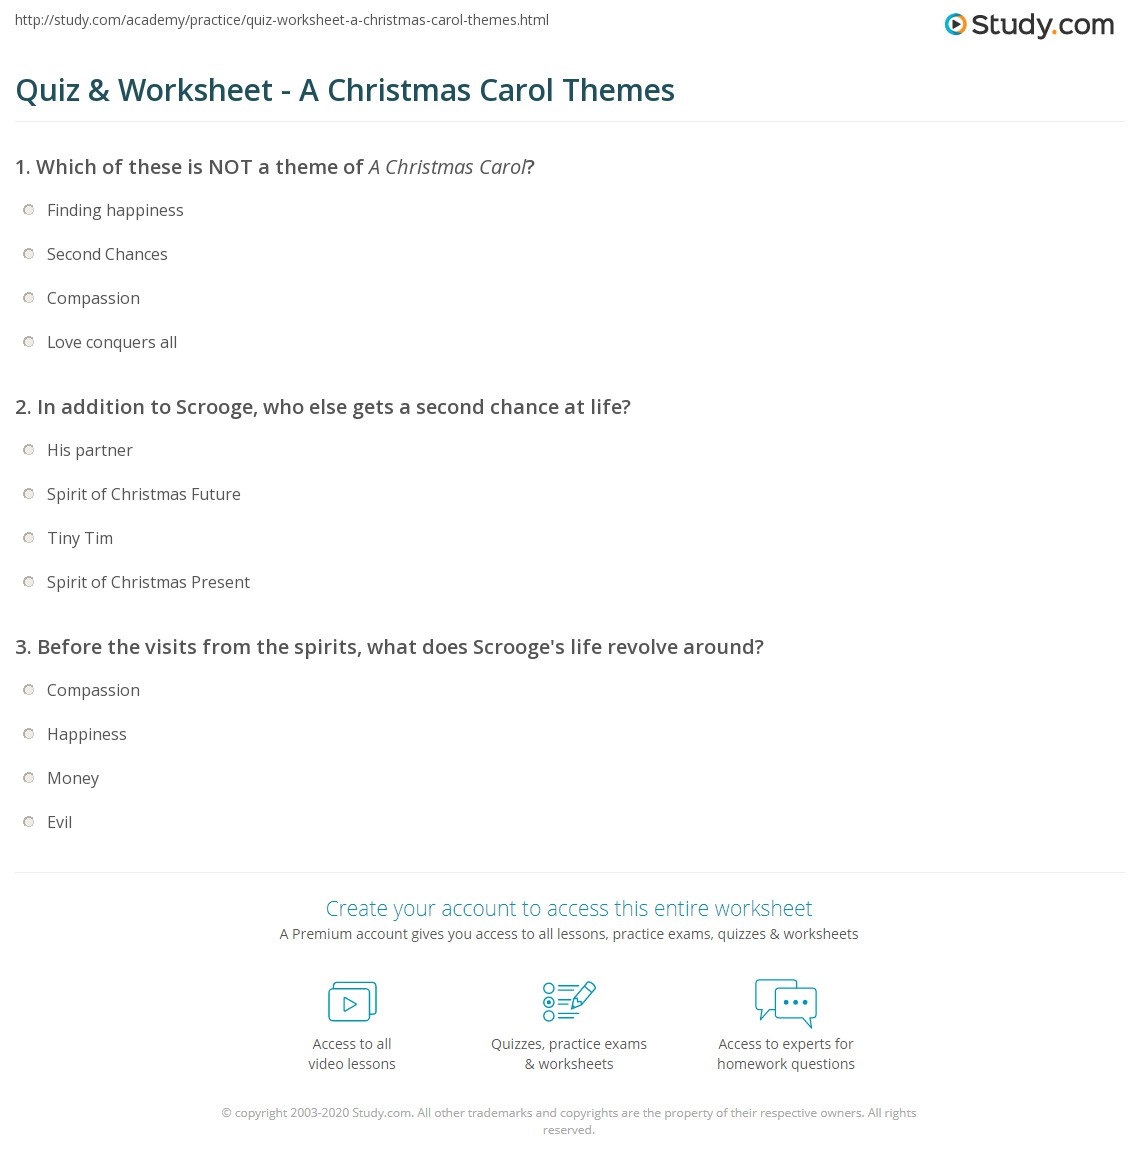 print a christmas carol themes worksheet - What Is The Theme Of A Christmas Carol